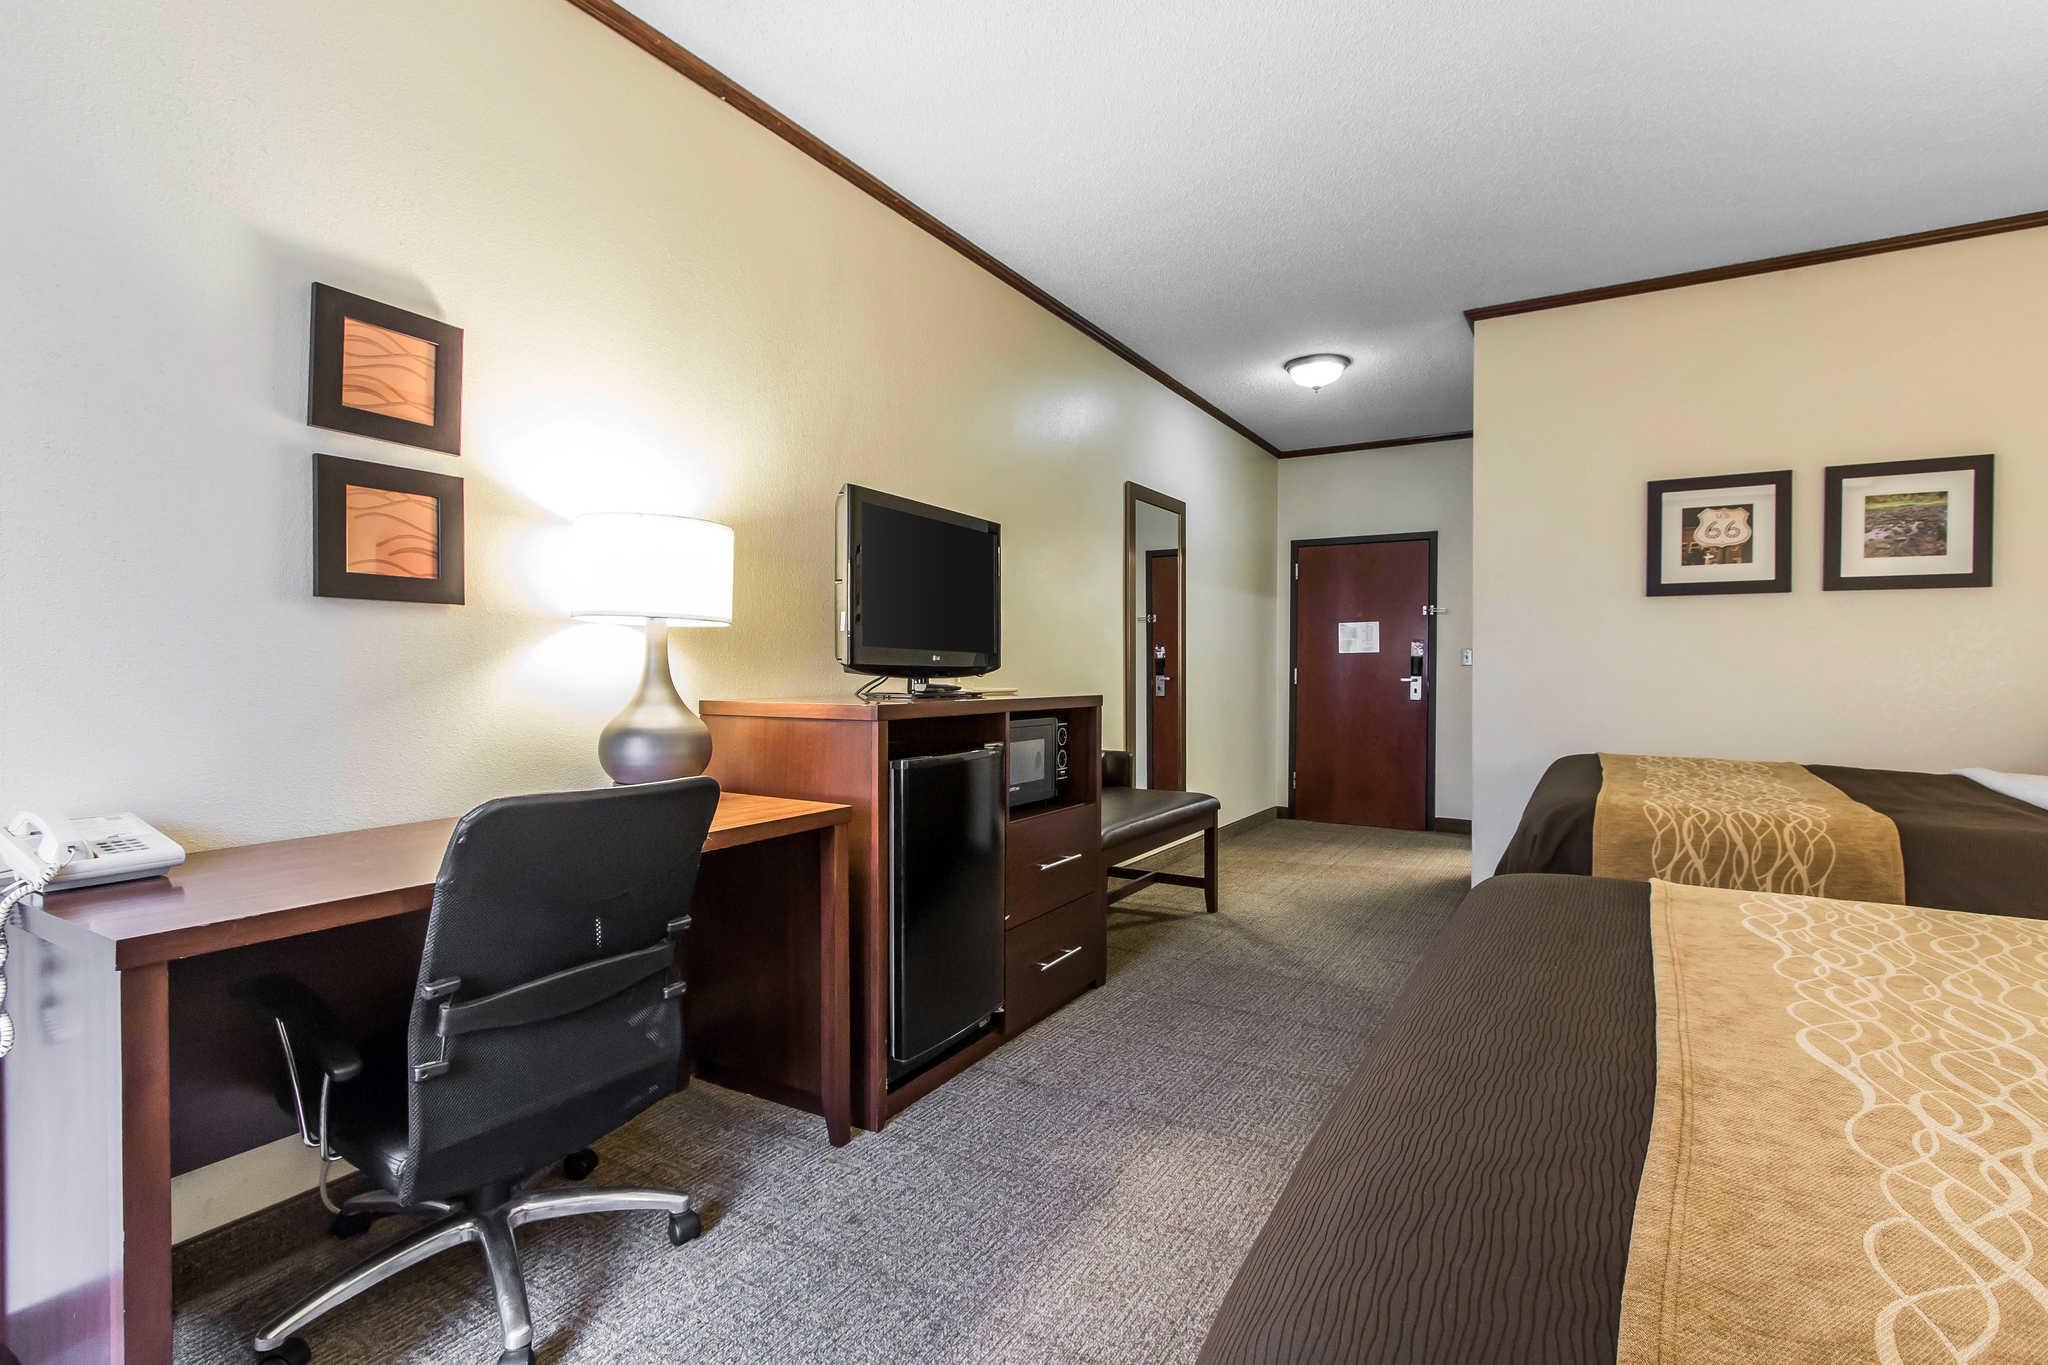 Comfort Inn & Suites Ardmore image 13